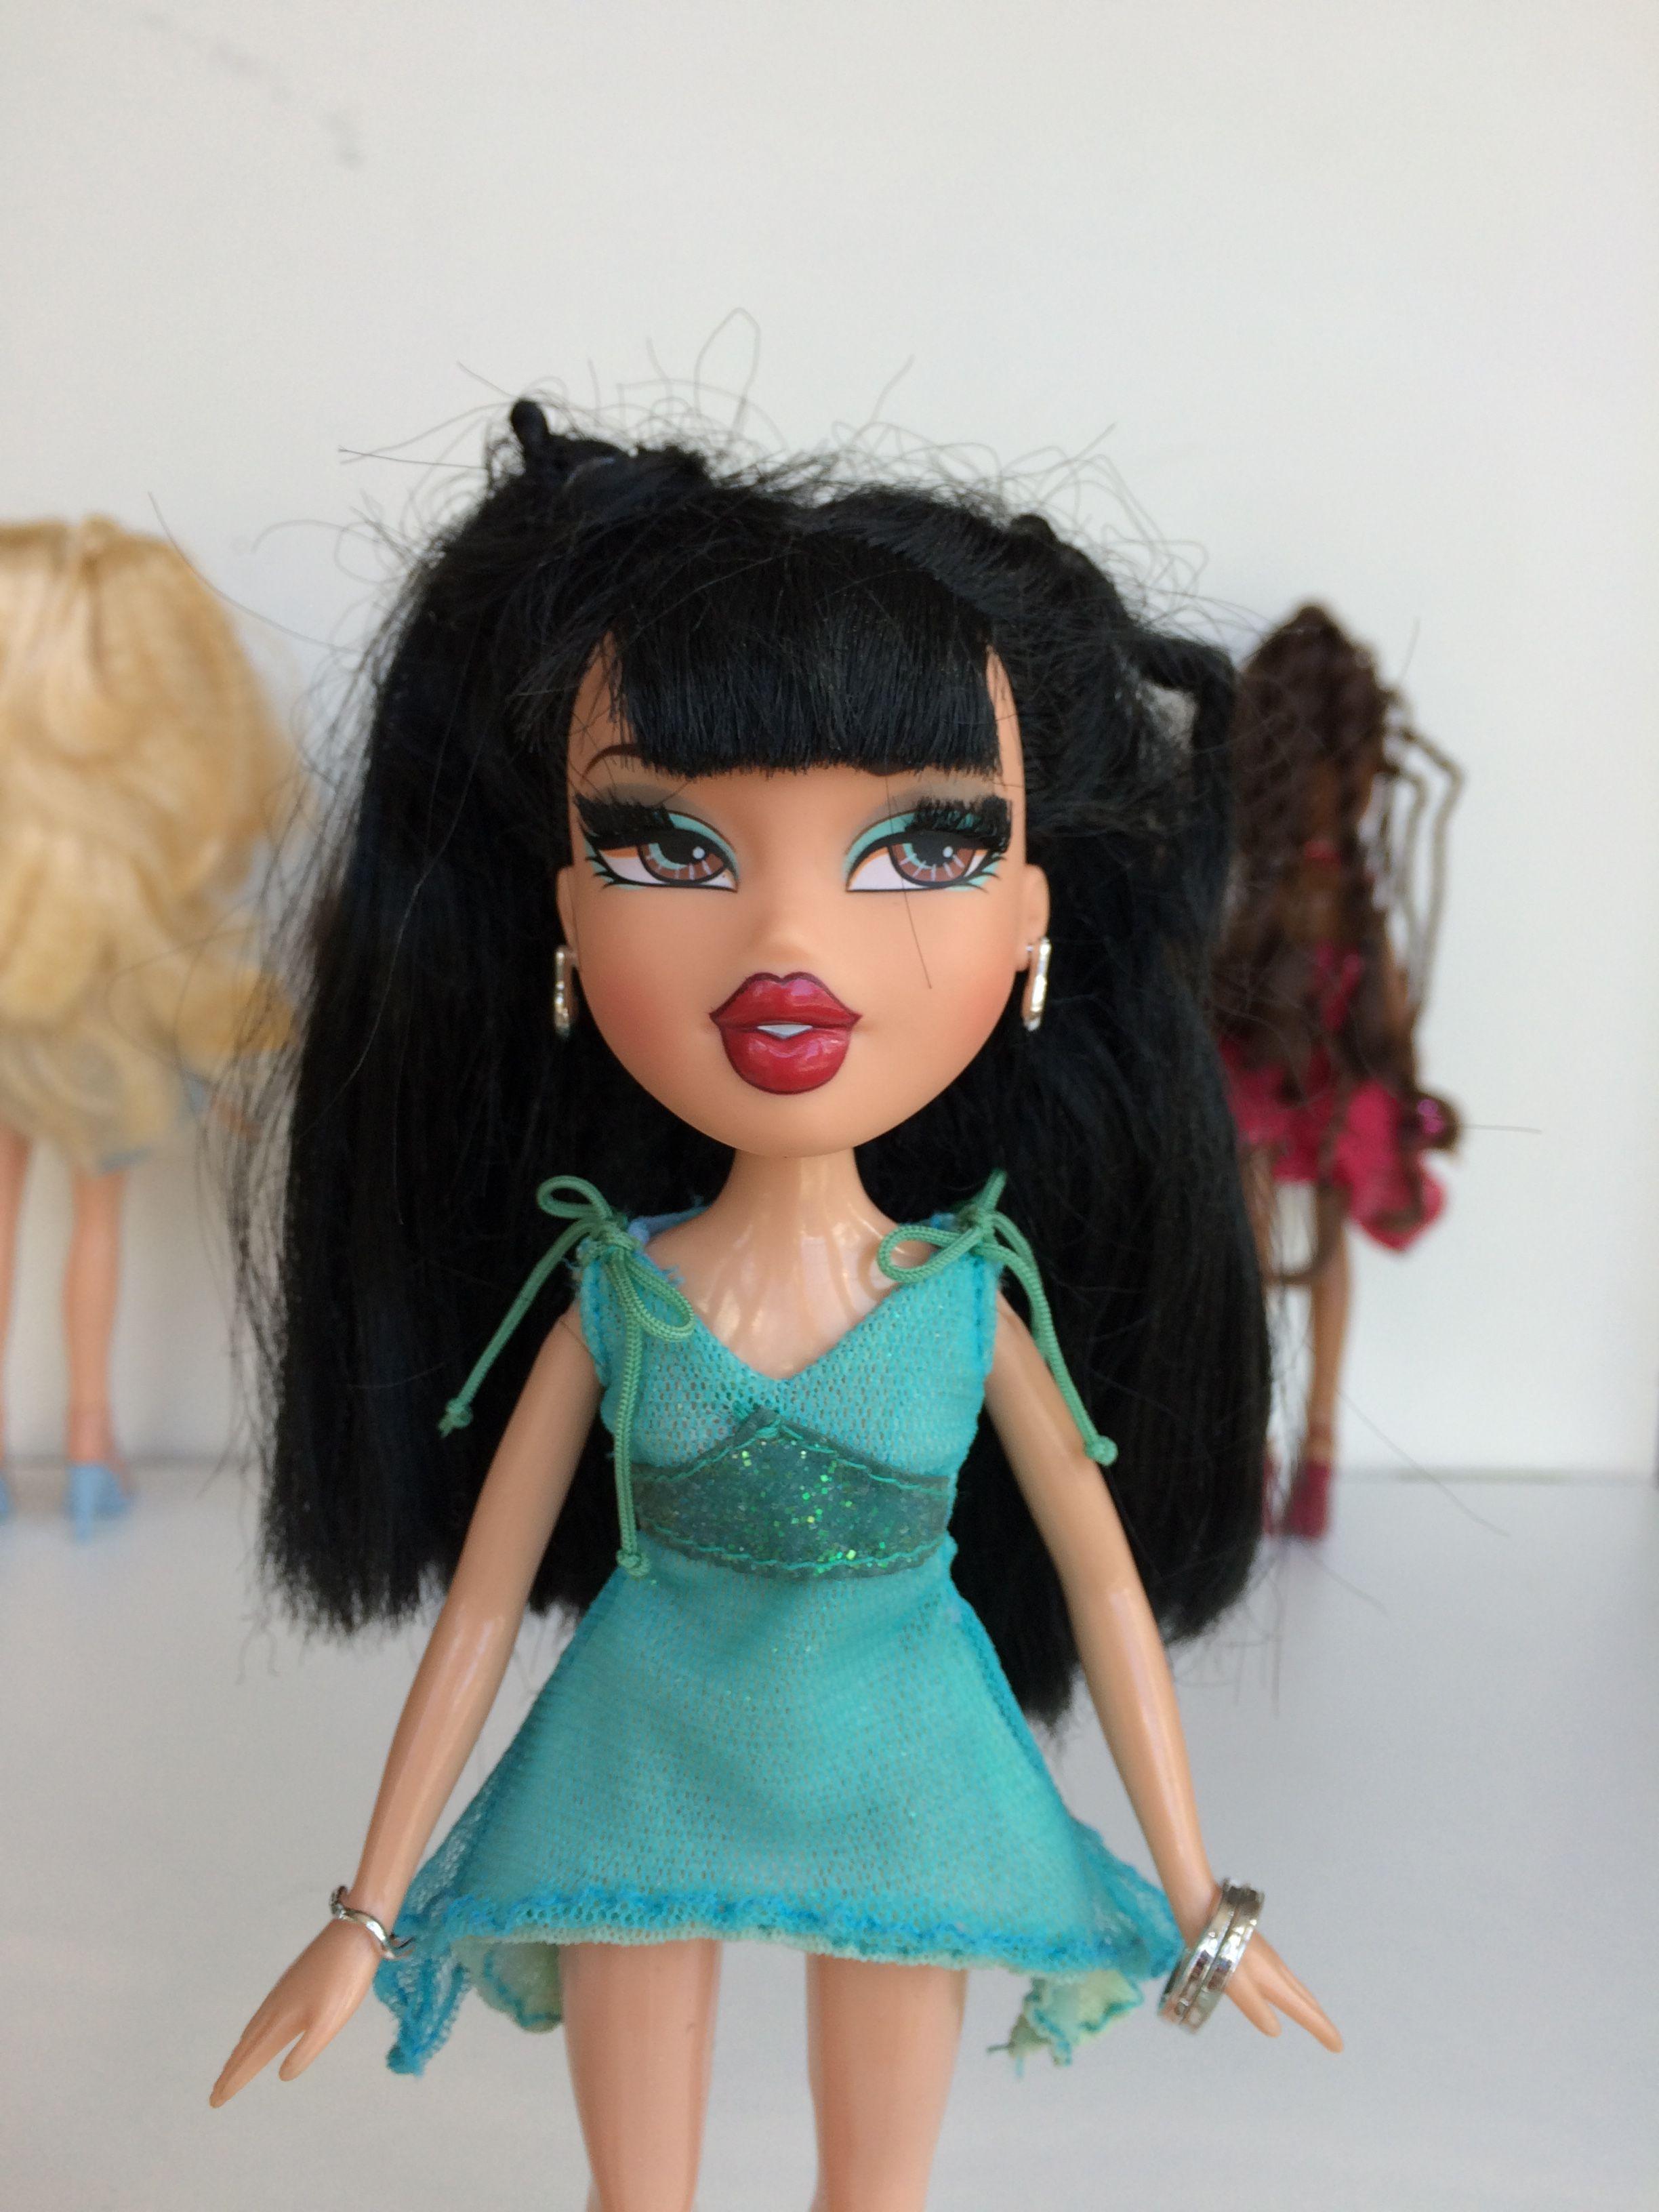 Bratz Featherageous Jade Doll Bratz Doll Newborn Baby Dolls Doll Scenes